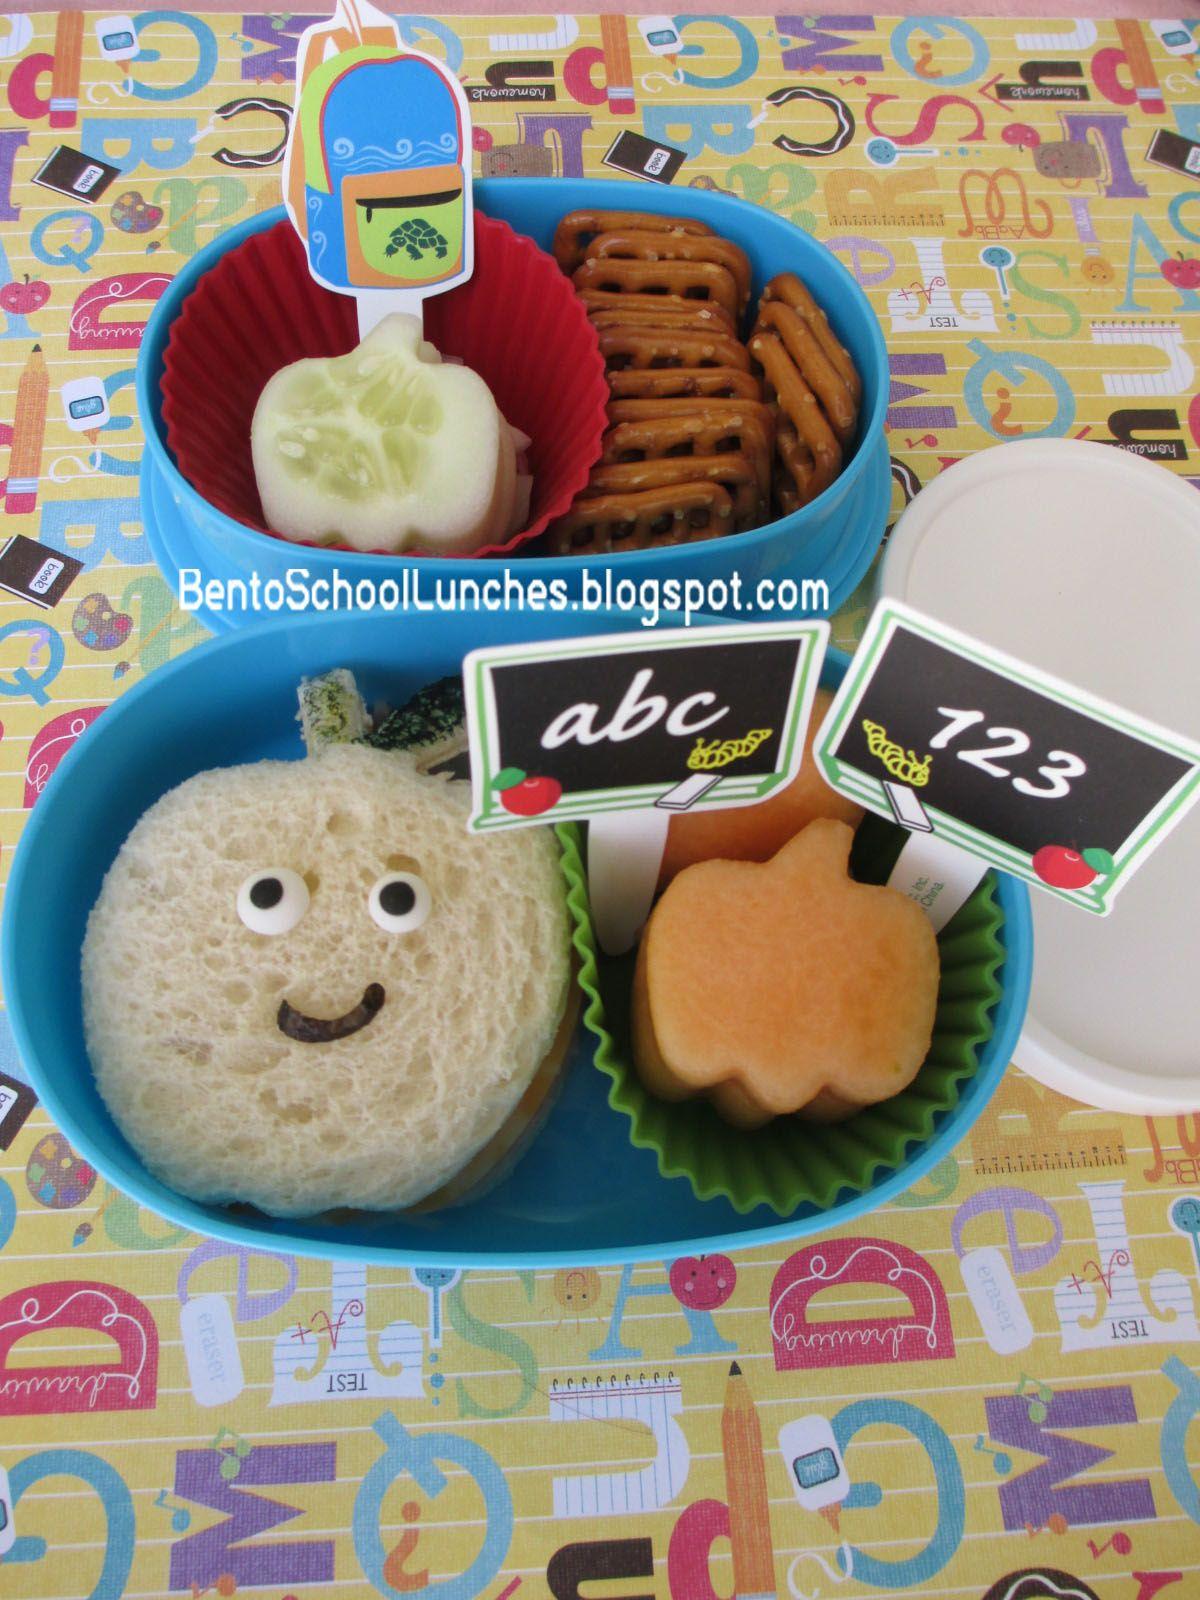 Bento School Lunches: Bento